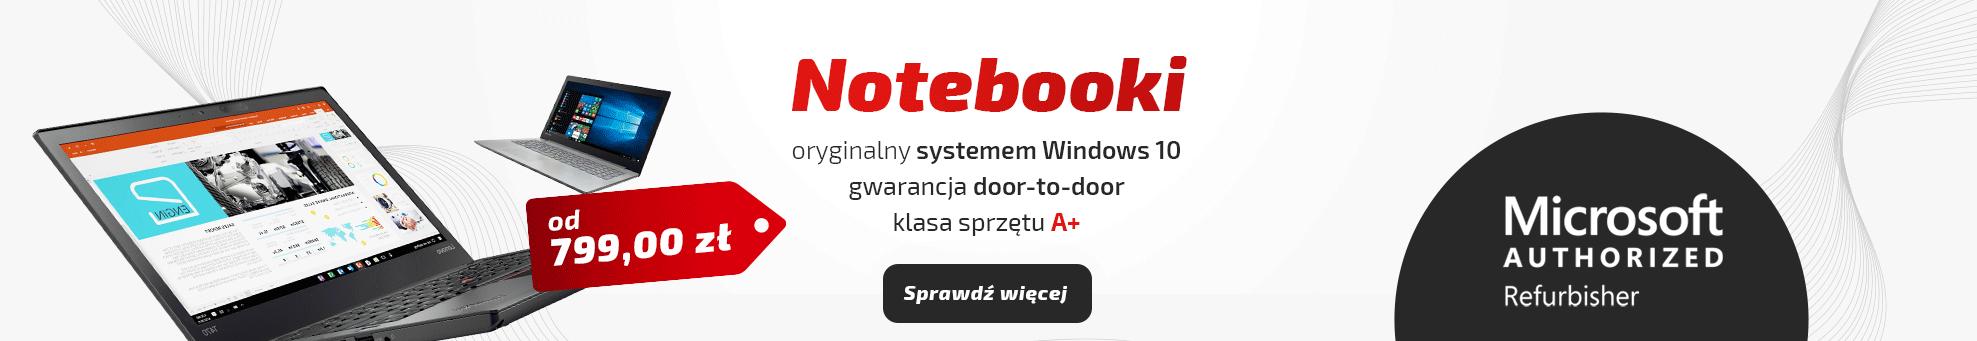 s2-notebooks